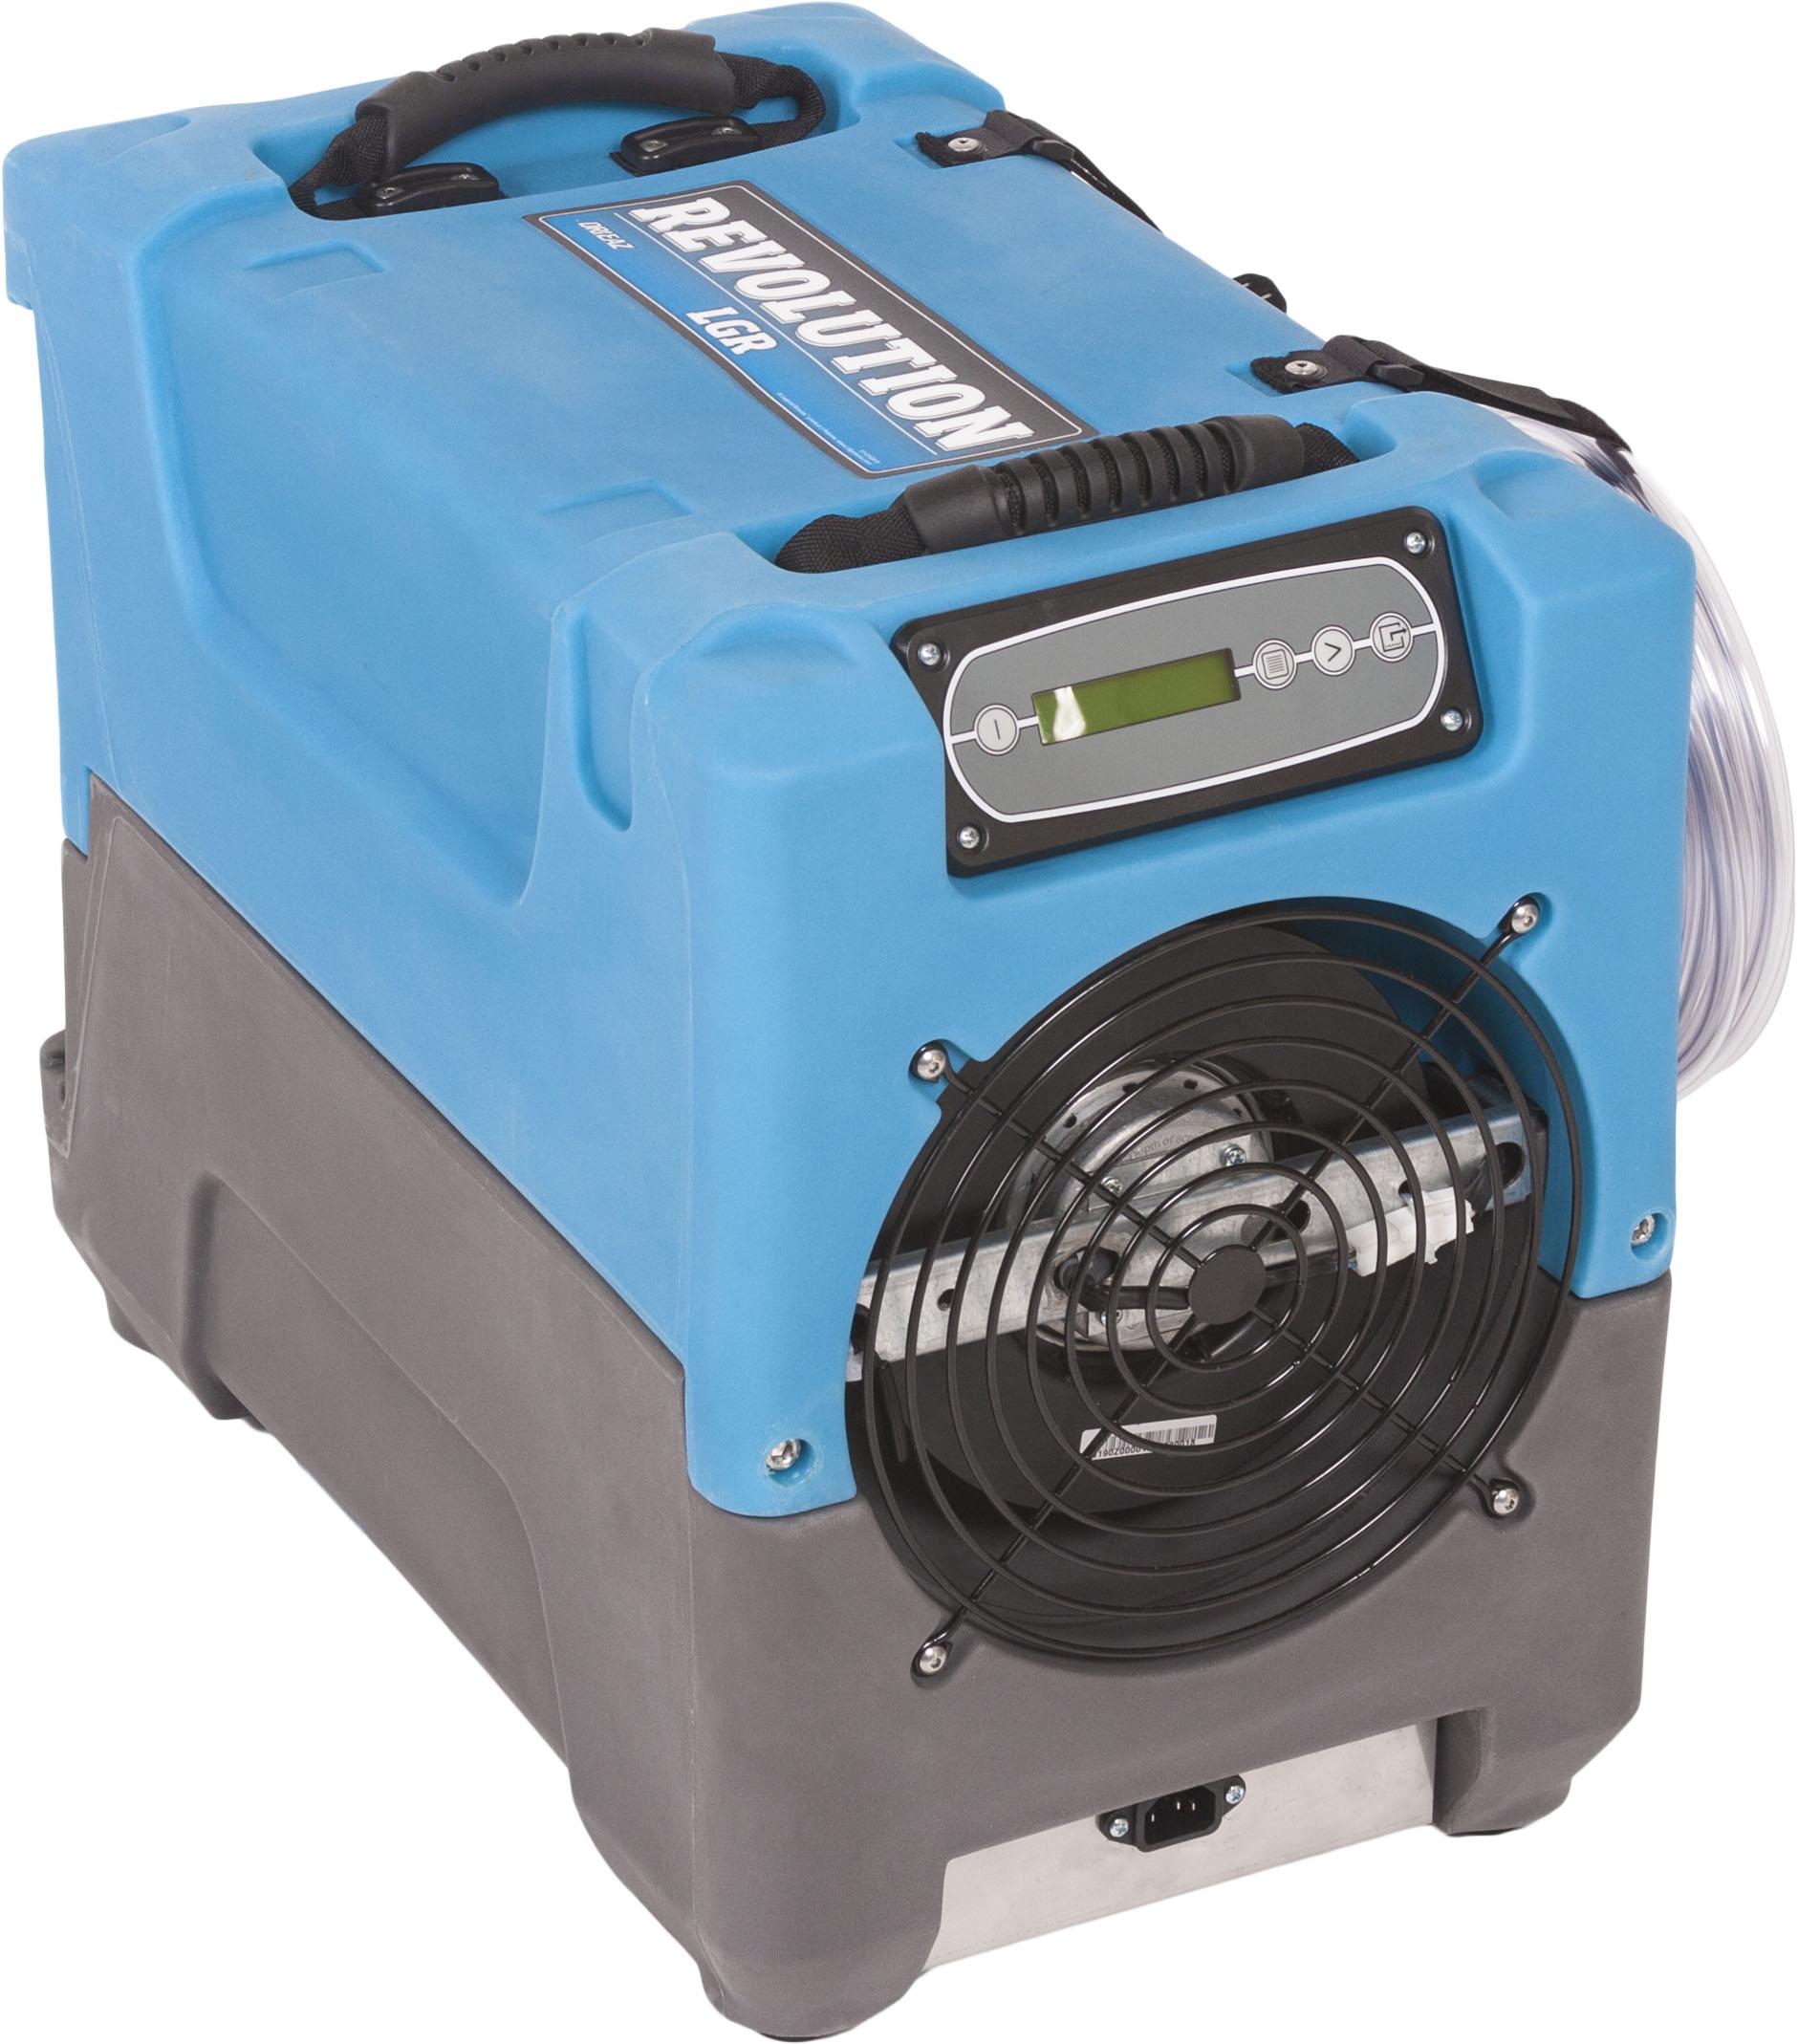 Dehumidifier - 14 GPD